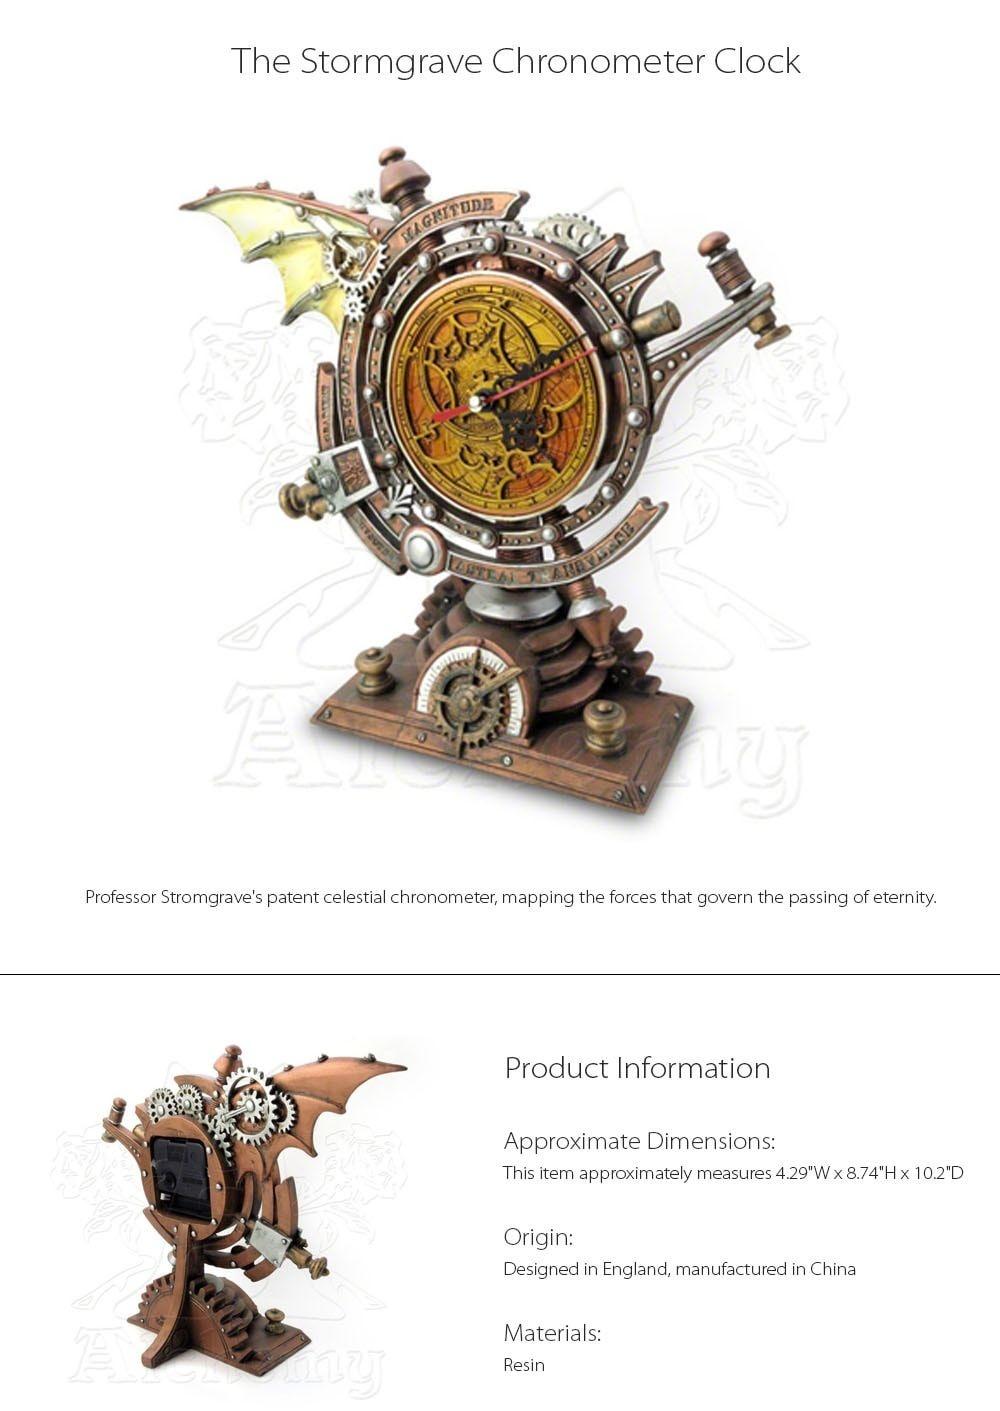 The Stormgrave Chronometer Clock Decorative Steampunk Clock